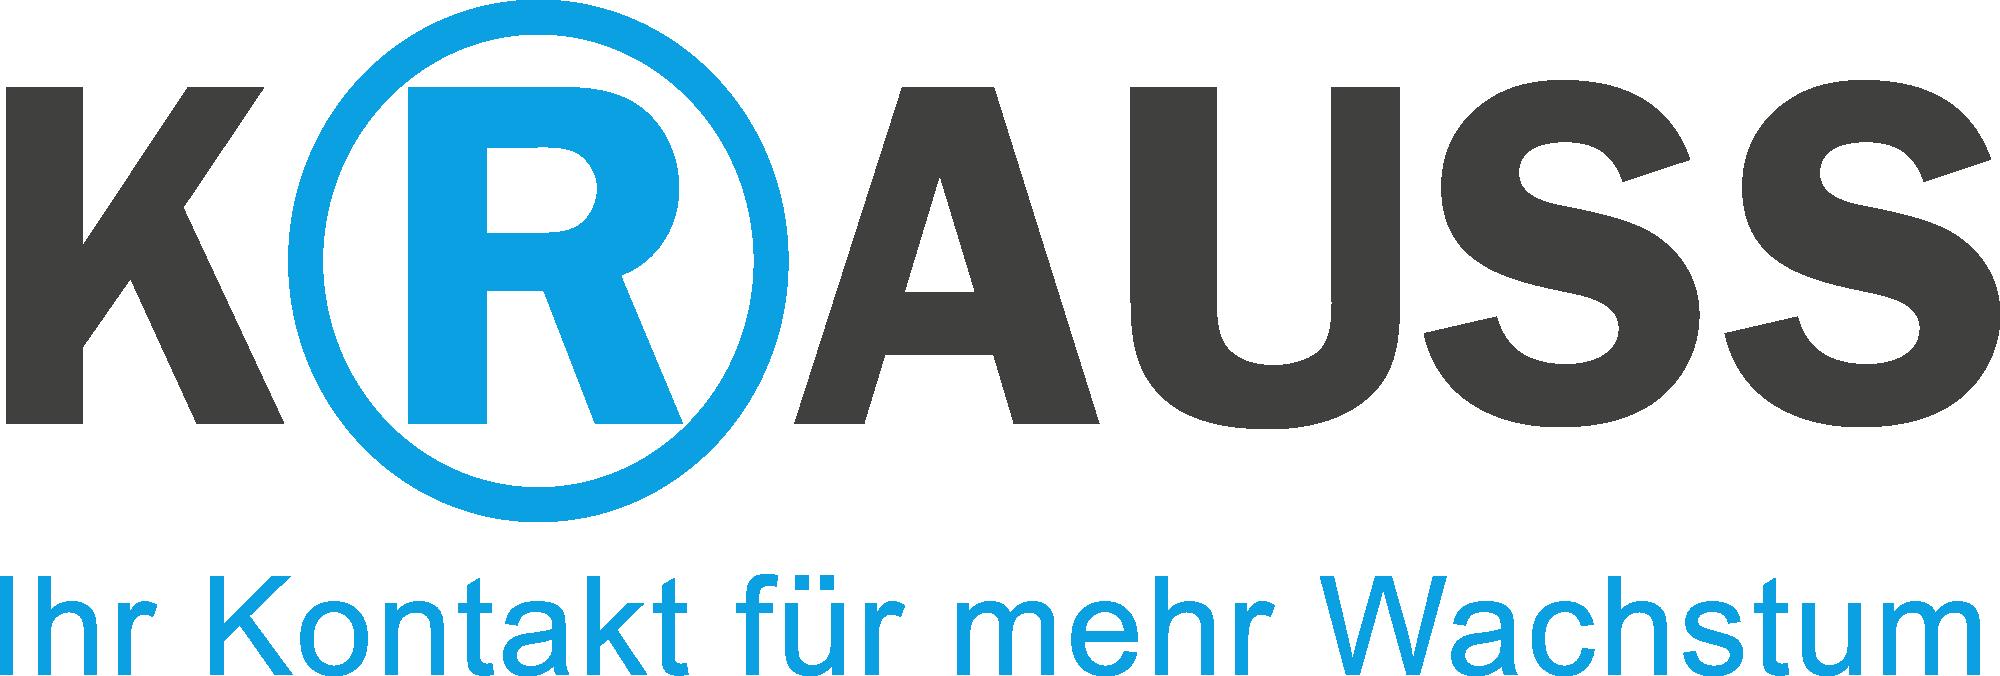 Krauss and Friends GmbH